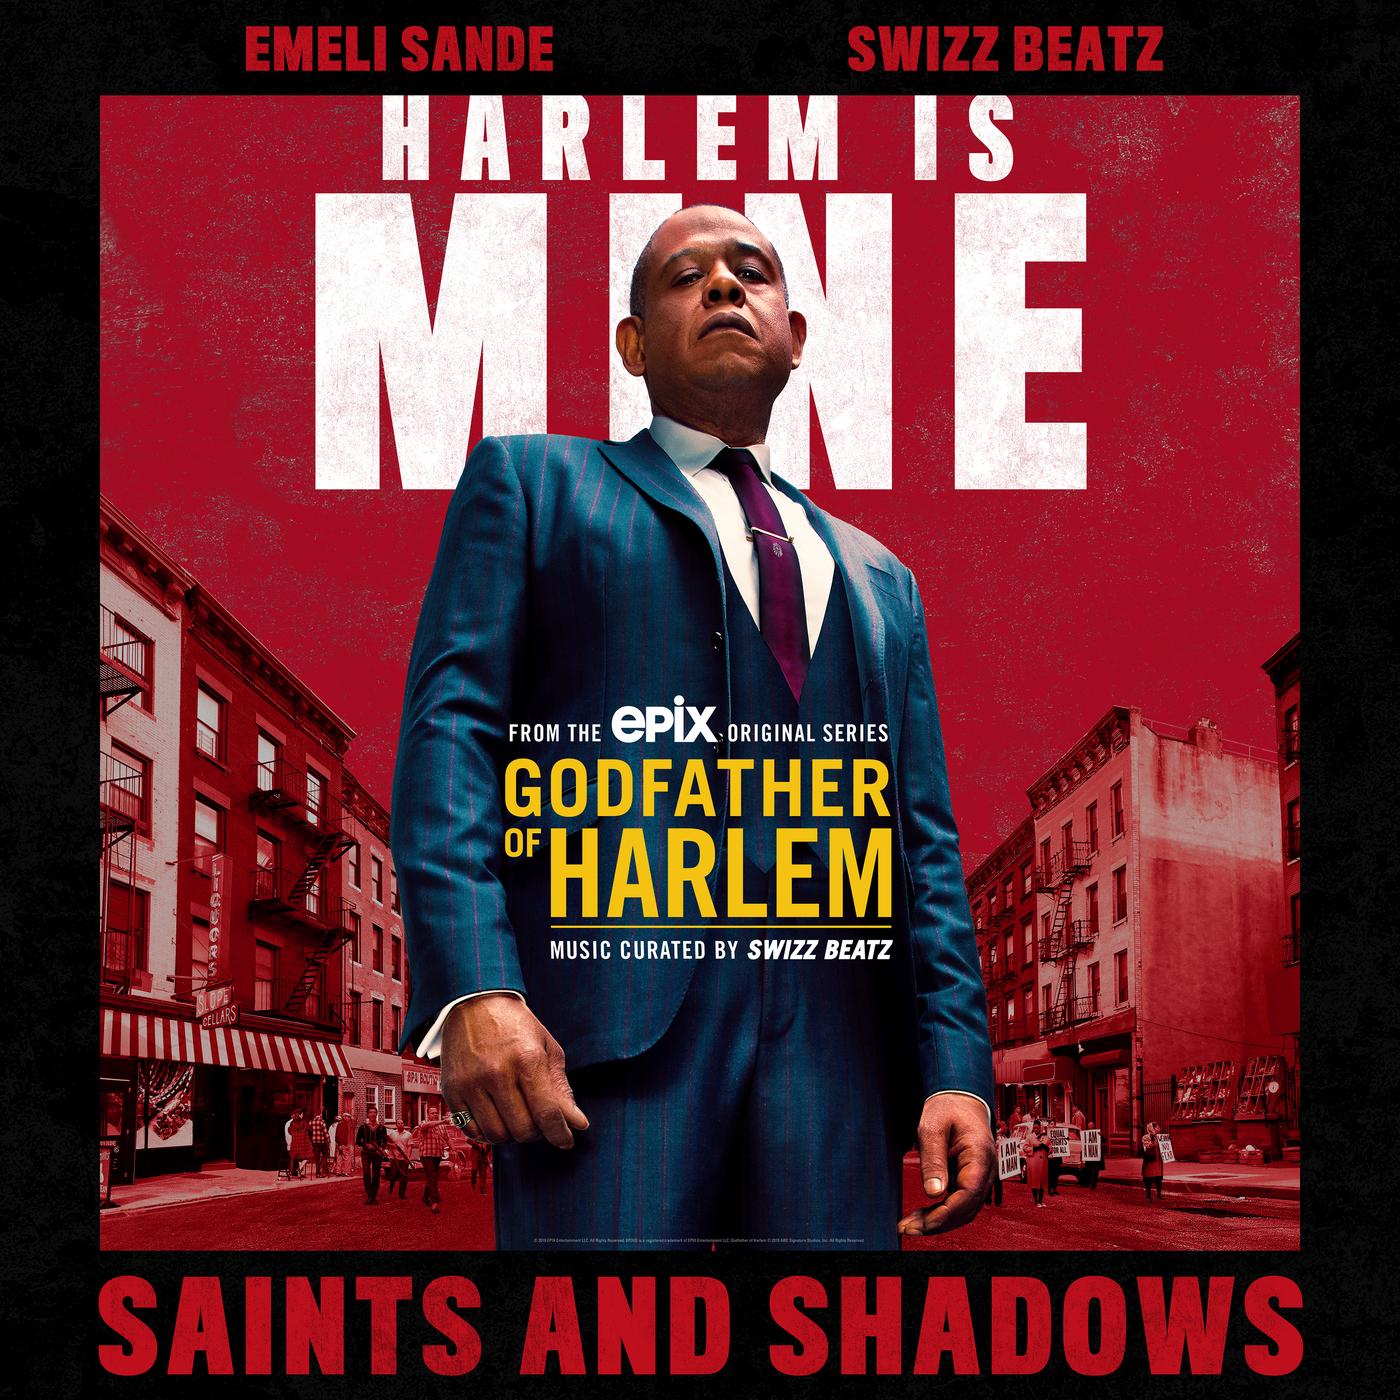 Saints and Shadows - Godfather of Harlem